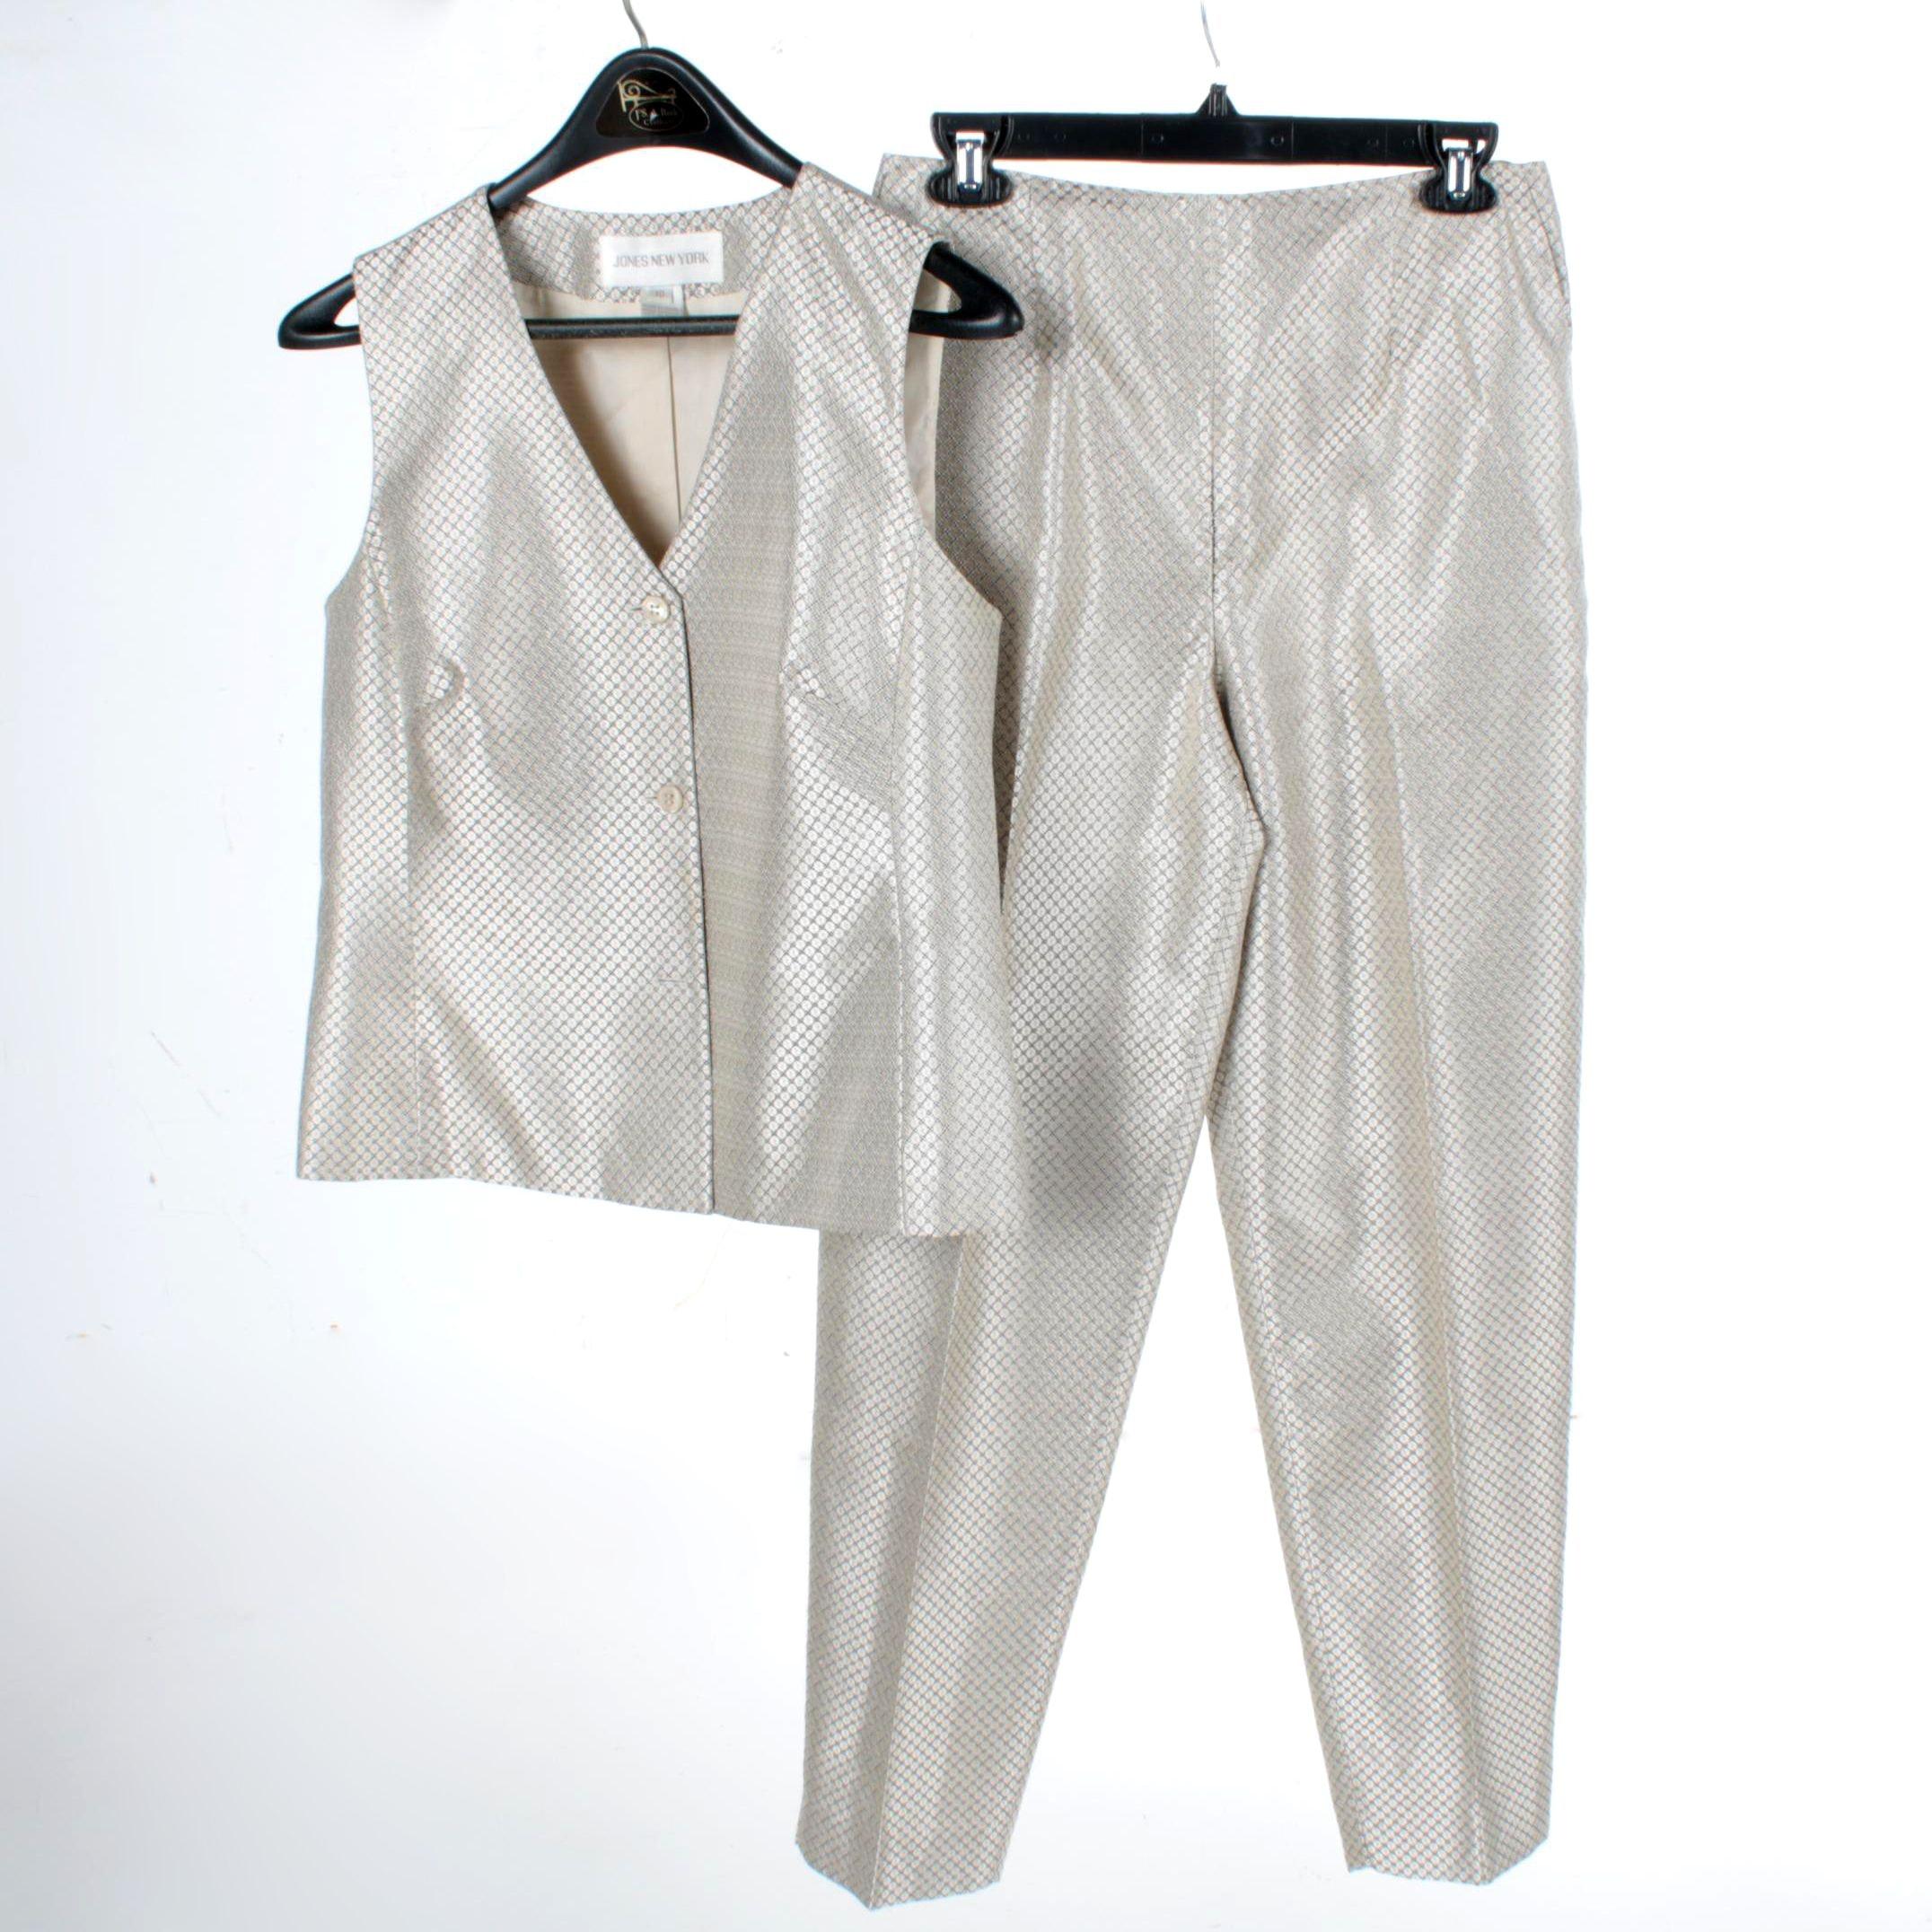 Women's Jones New York Vest and Pant Set